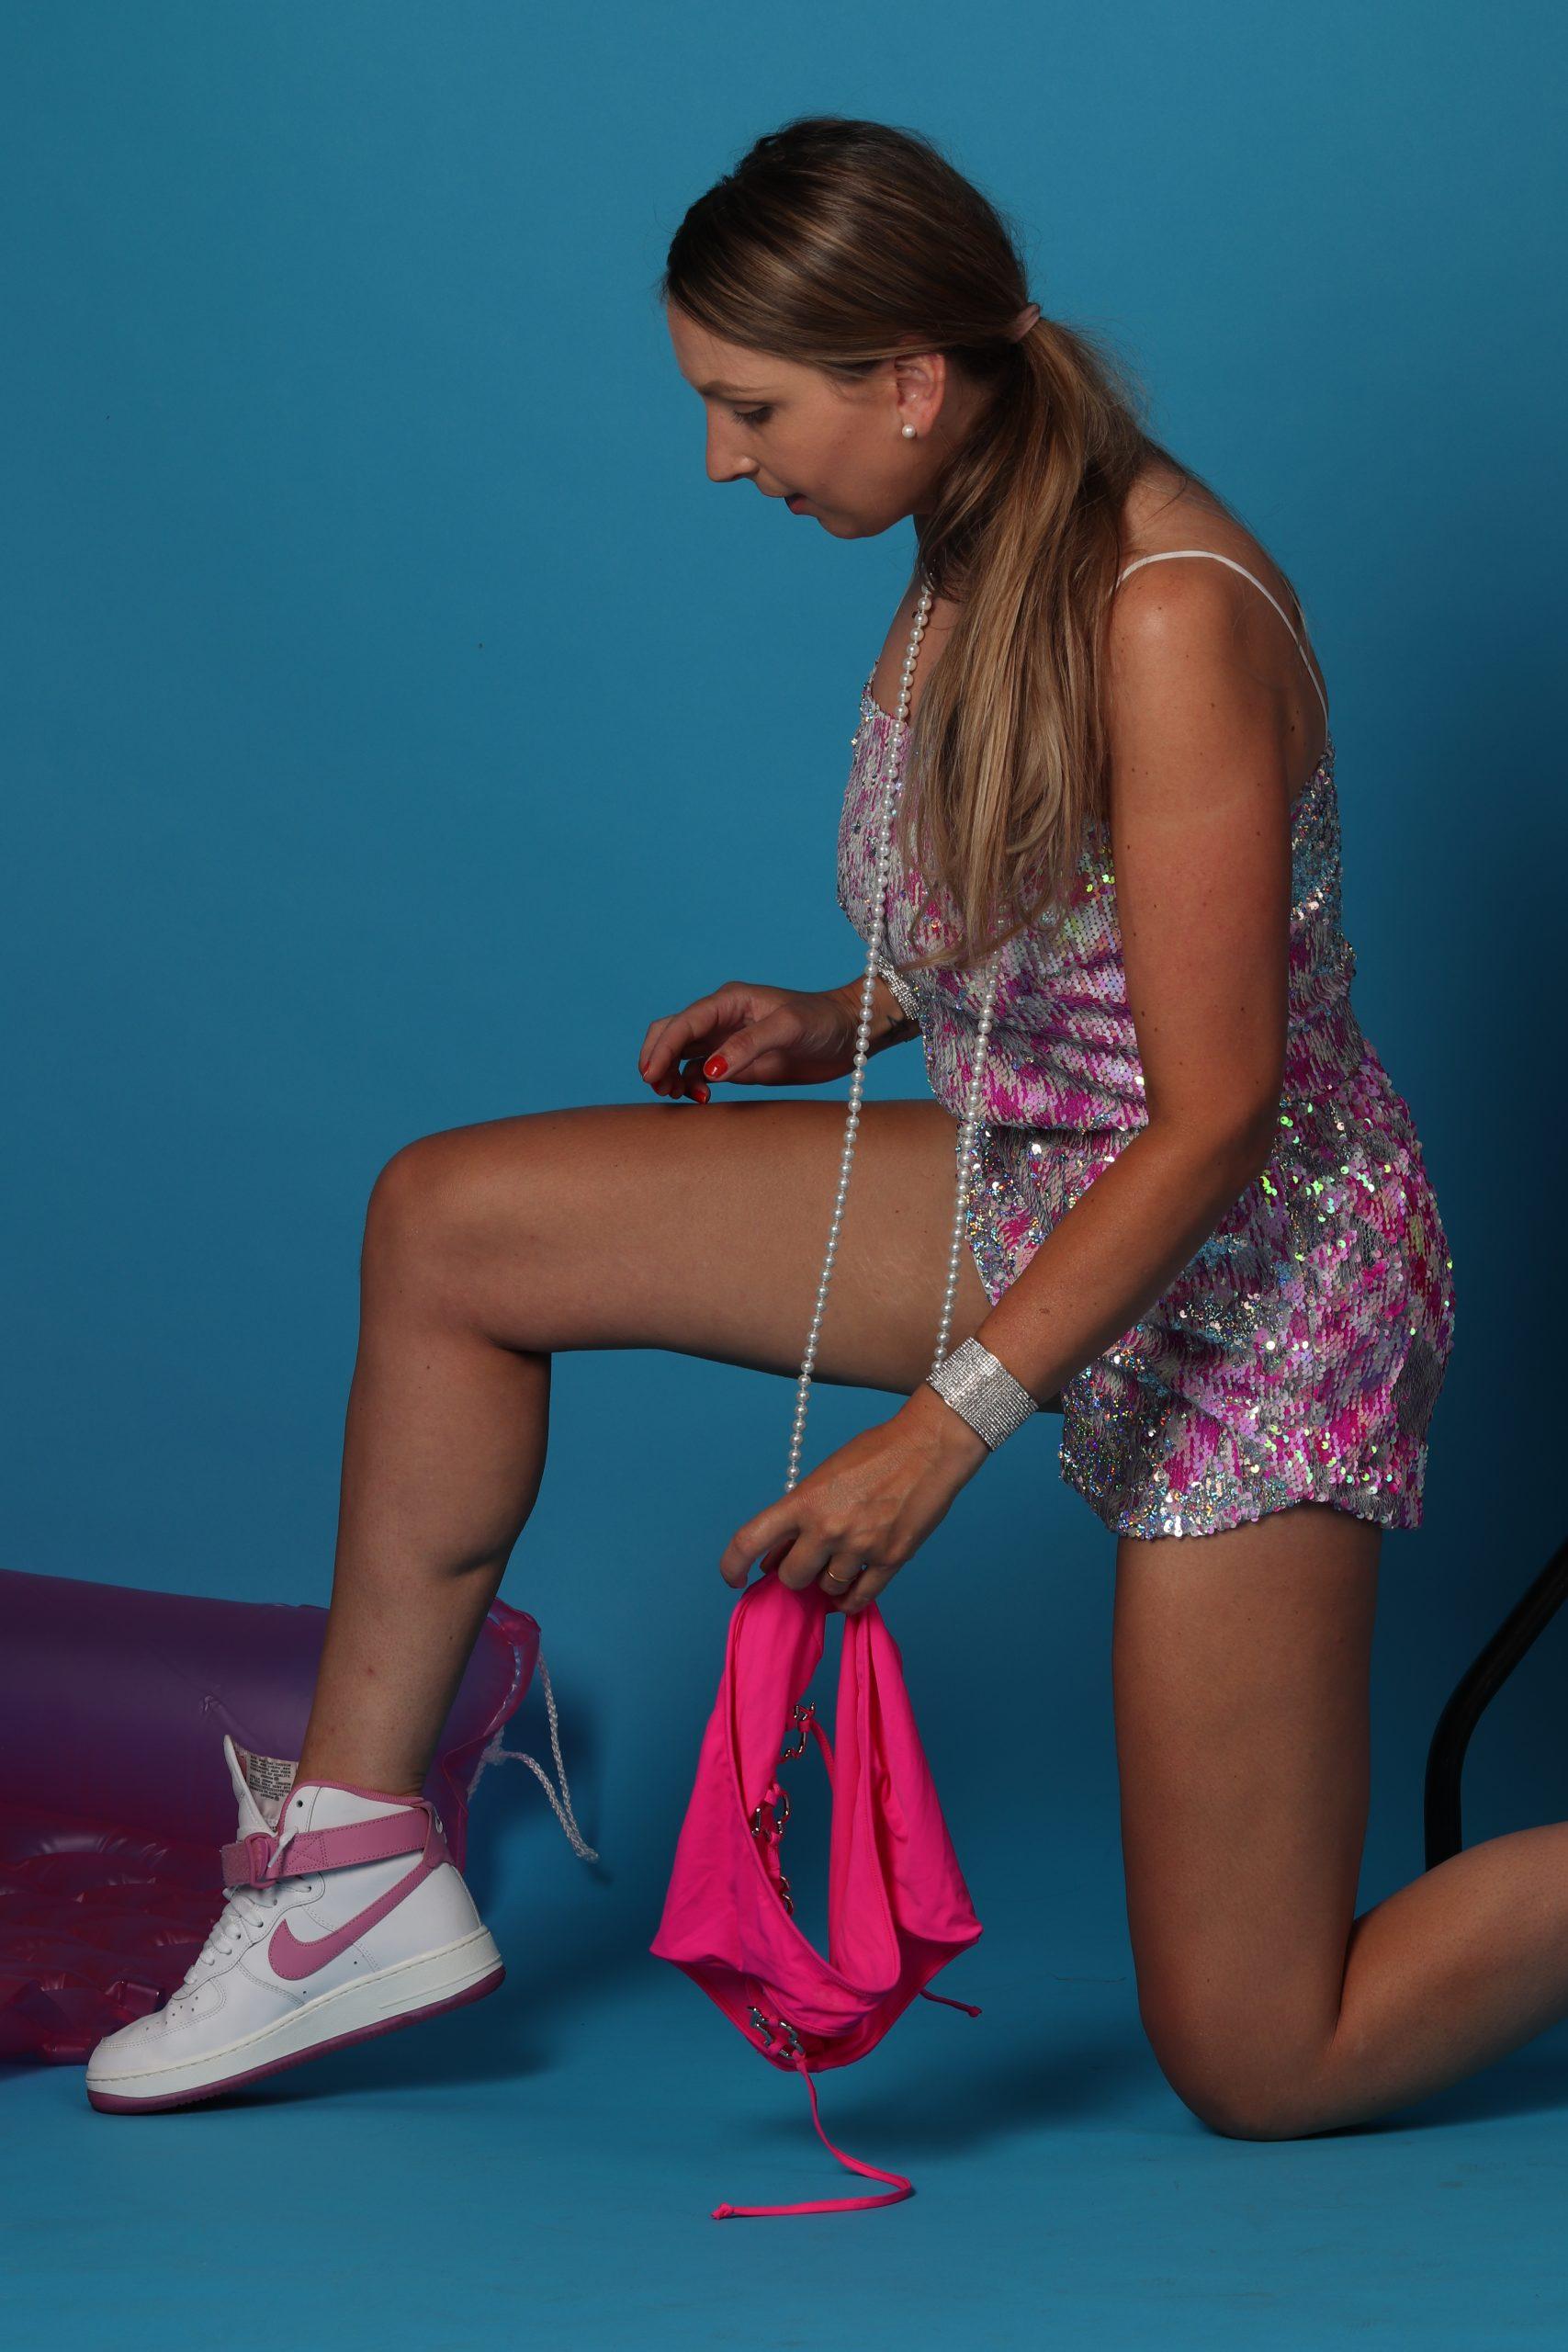 topshop sequin pailletten fashion mode roze astrid alida fotografie fotostudio nike nikebyyou witte sneakers